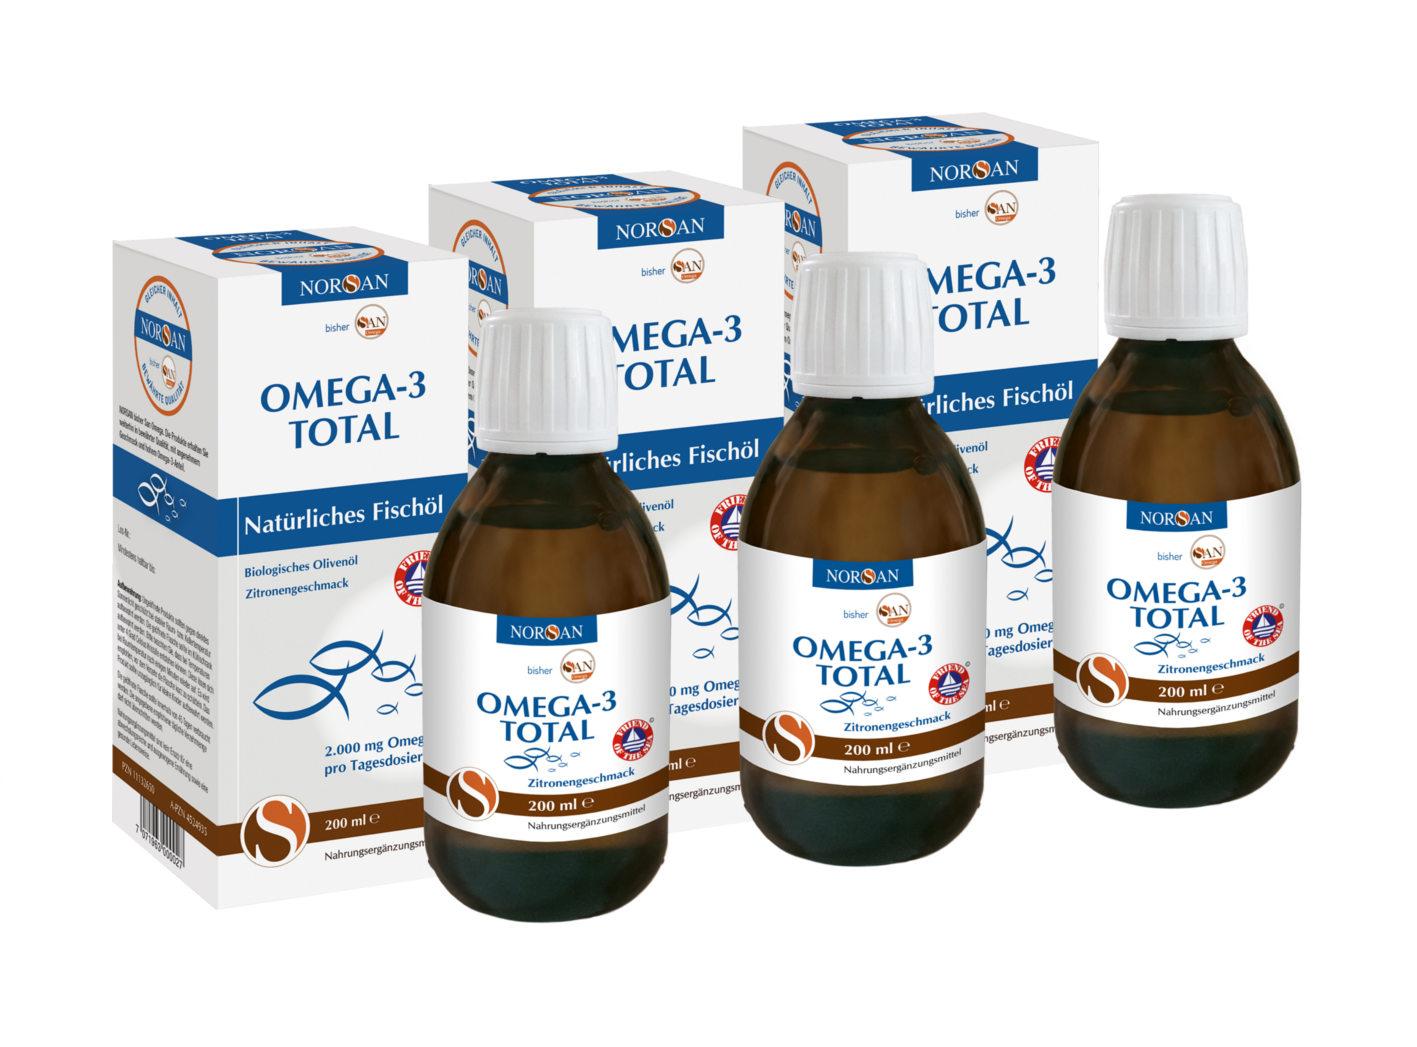 San Omega GmbH NORSAN Omega-3 Fischöl Total 200 ml im günstigen 3er Set